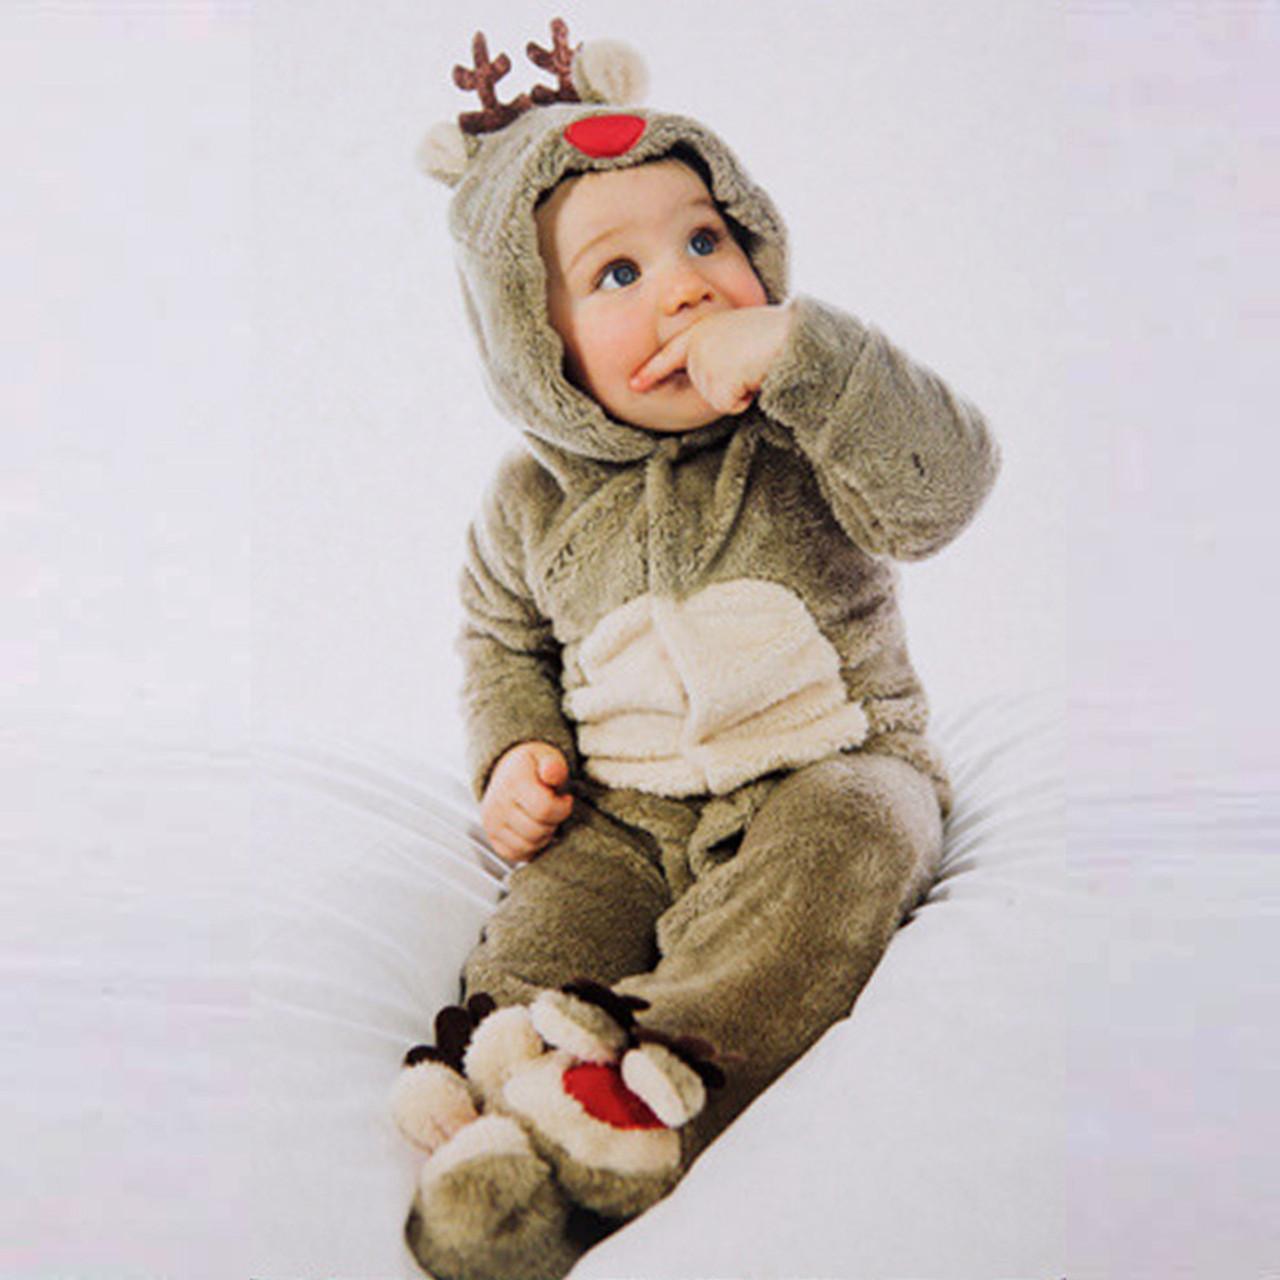 1d99d302312c Unisex Baby Rompers Fleece Newborn Baby Clothes Long Sleeve Cartoon deer  Infant Jumpsuit Toddler Kids Christmas ...